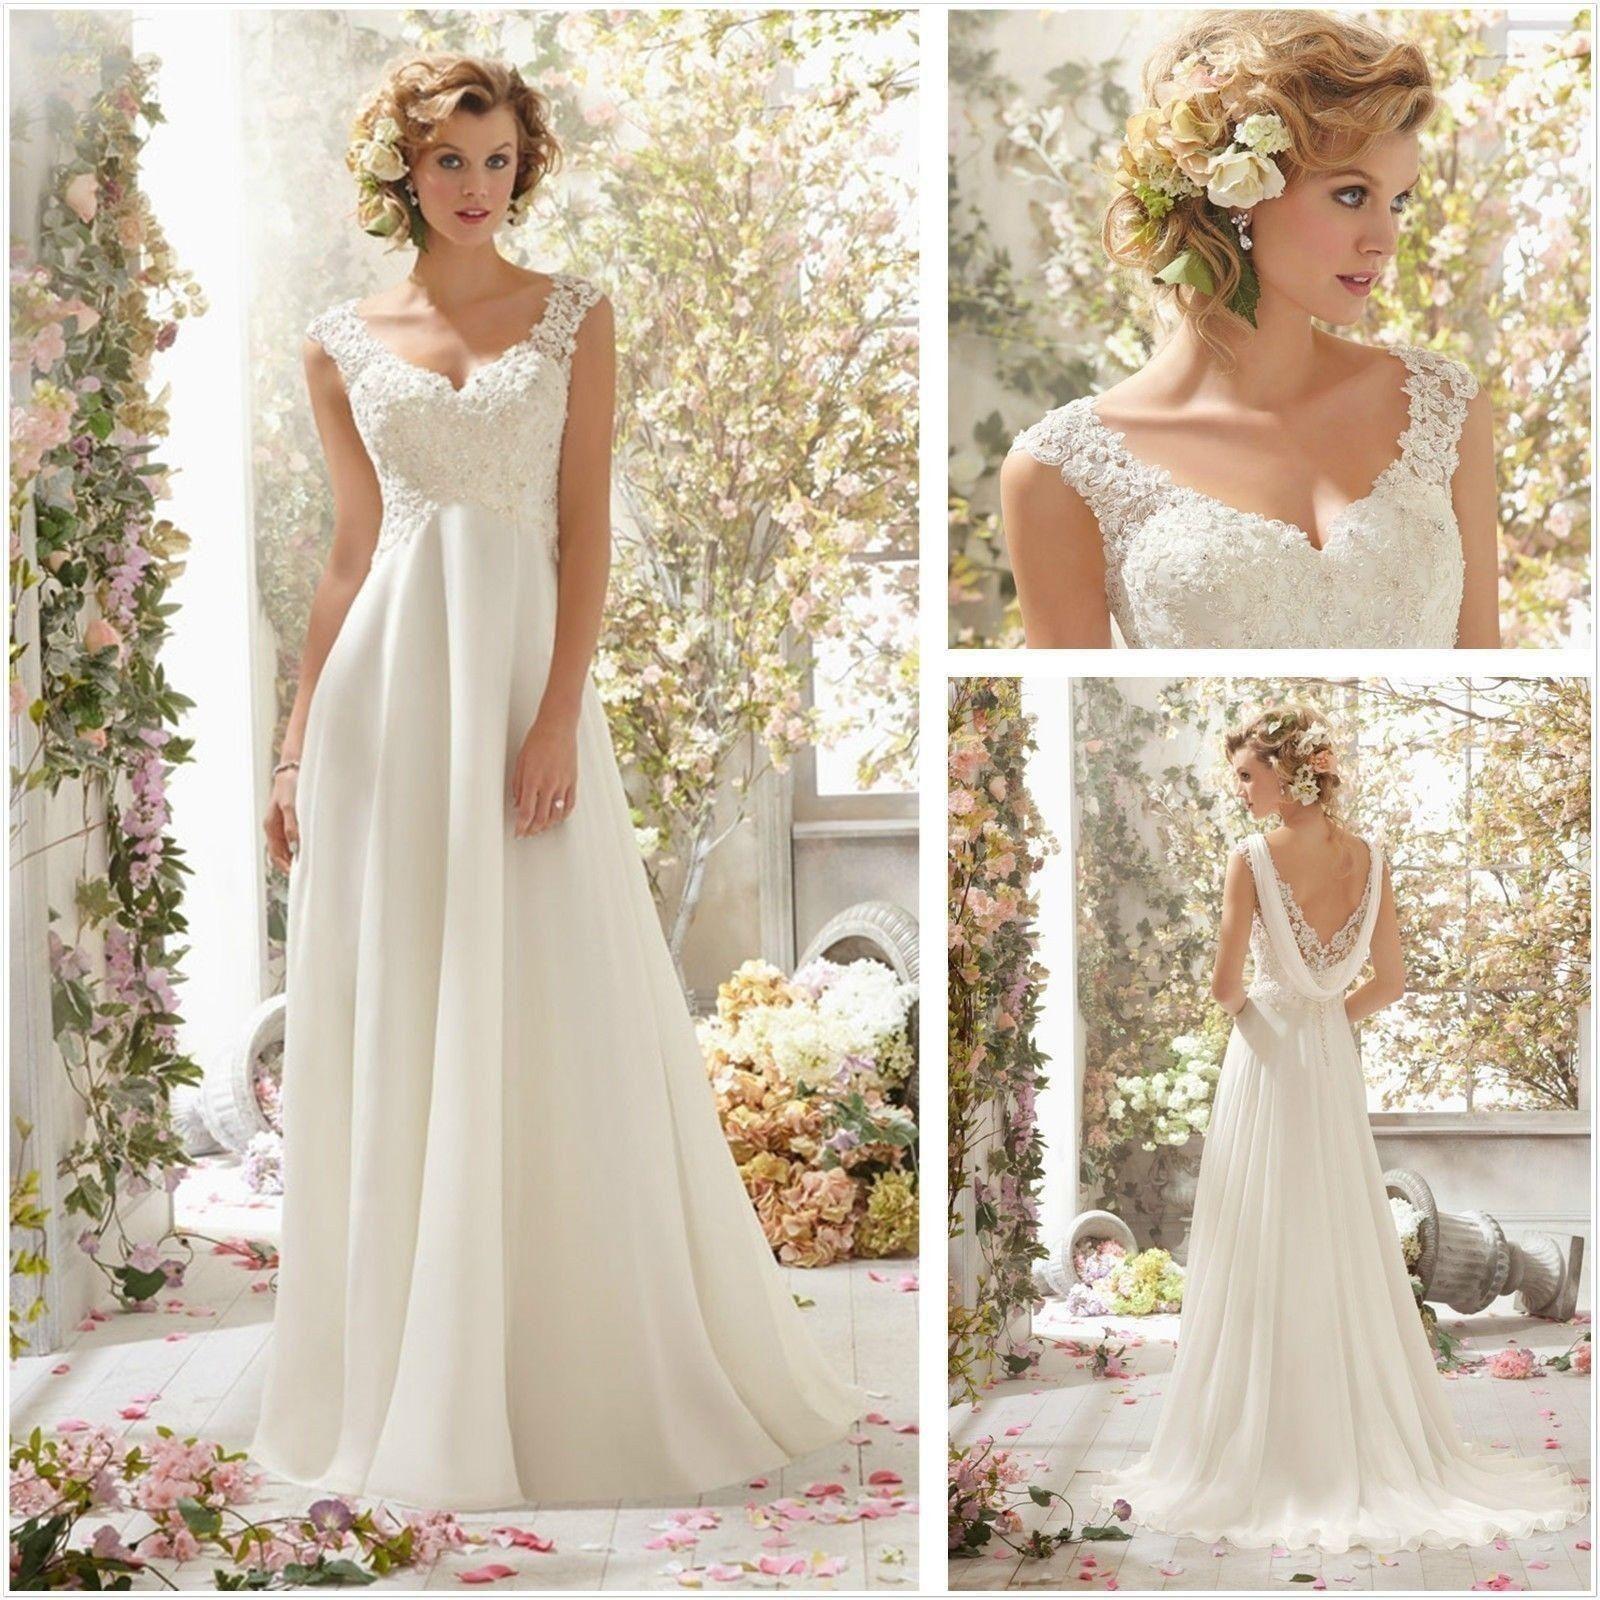 White Ivory Charming New Hot Selling Top Fashion V Neck Chiffon Beach Wedding Dress In